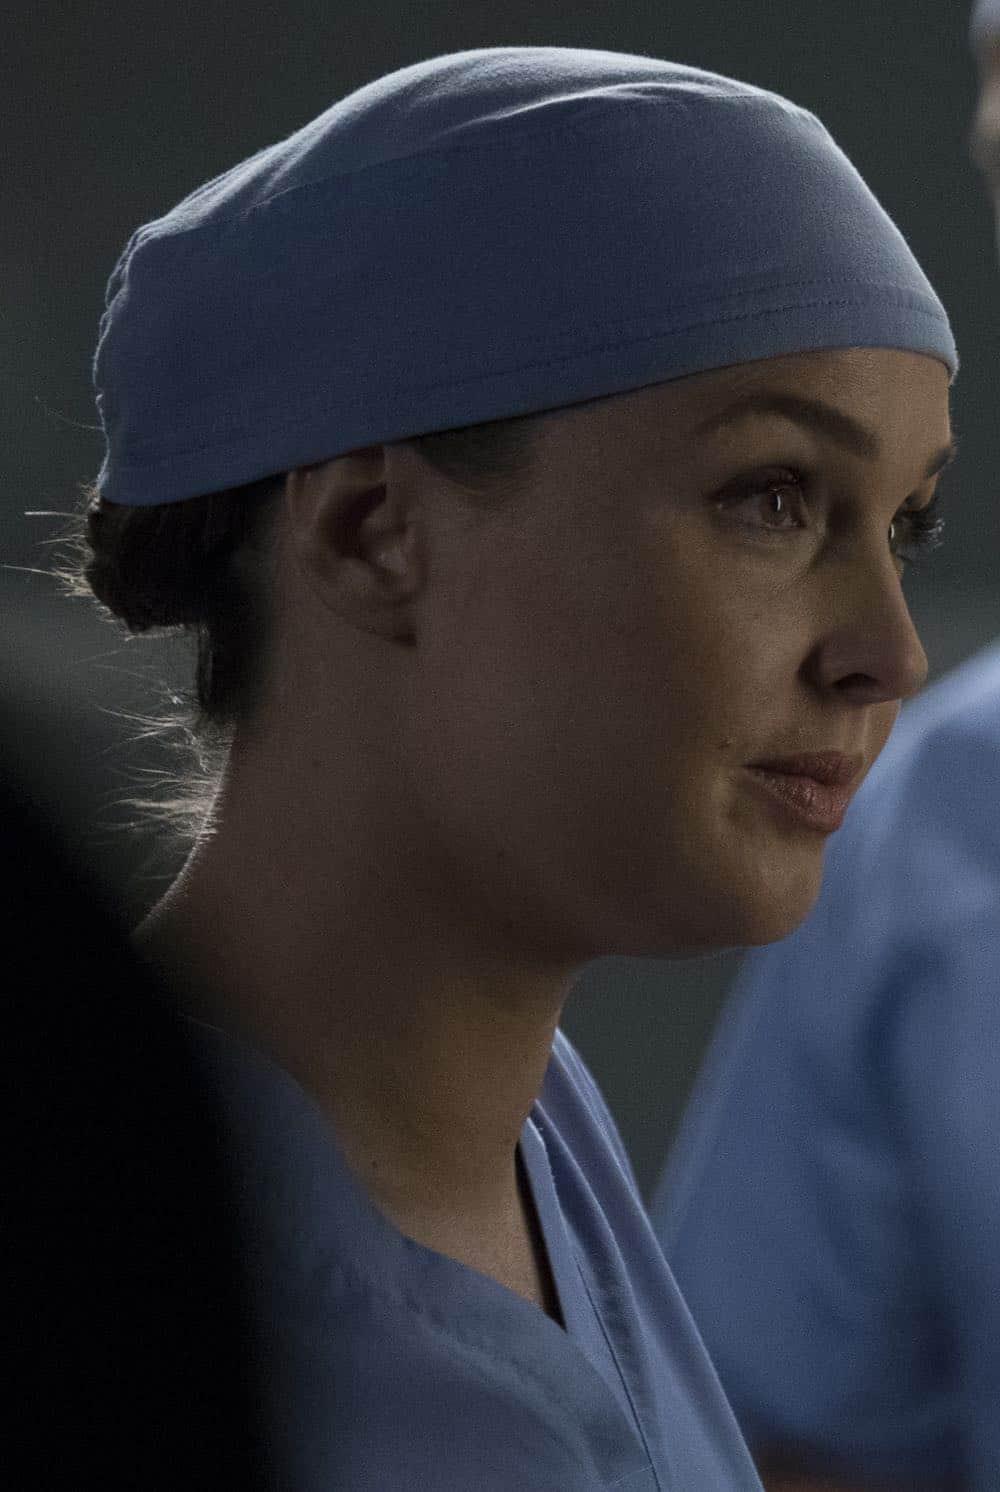 Greys Anatomy Episode 19 Season 14 Beautiful Dreamer 06